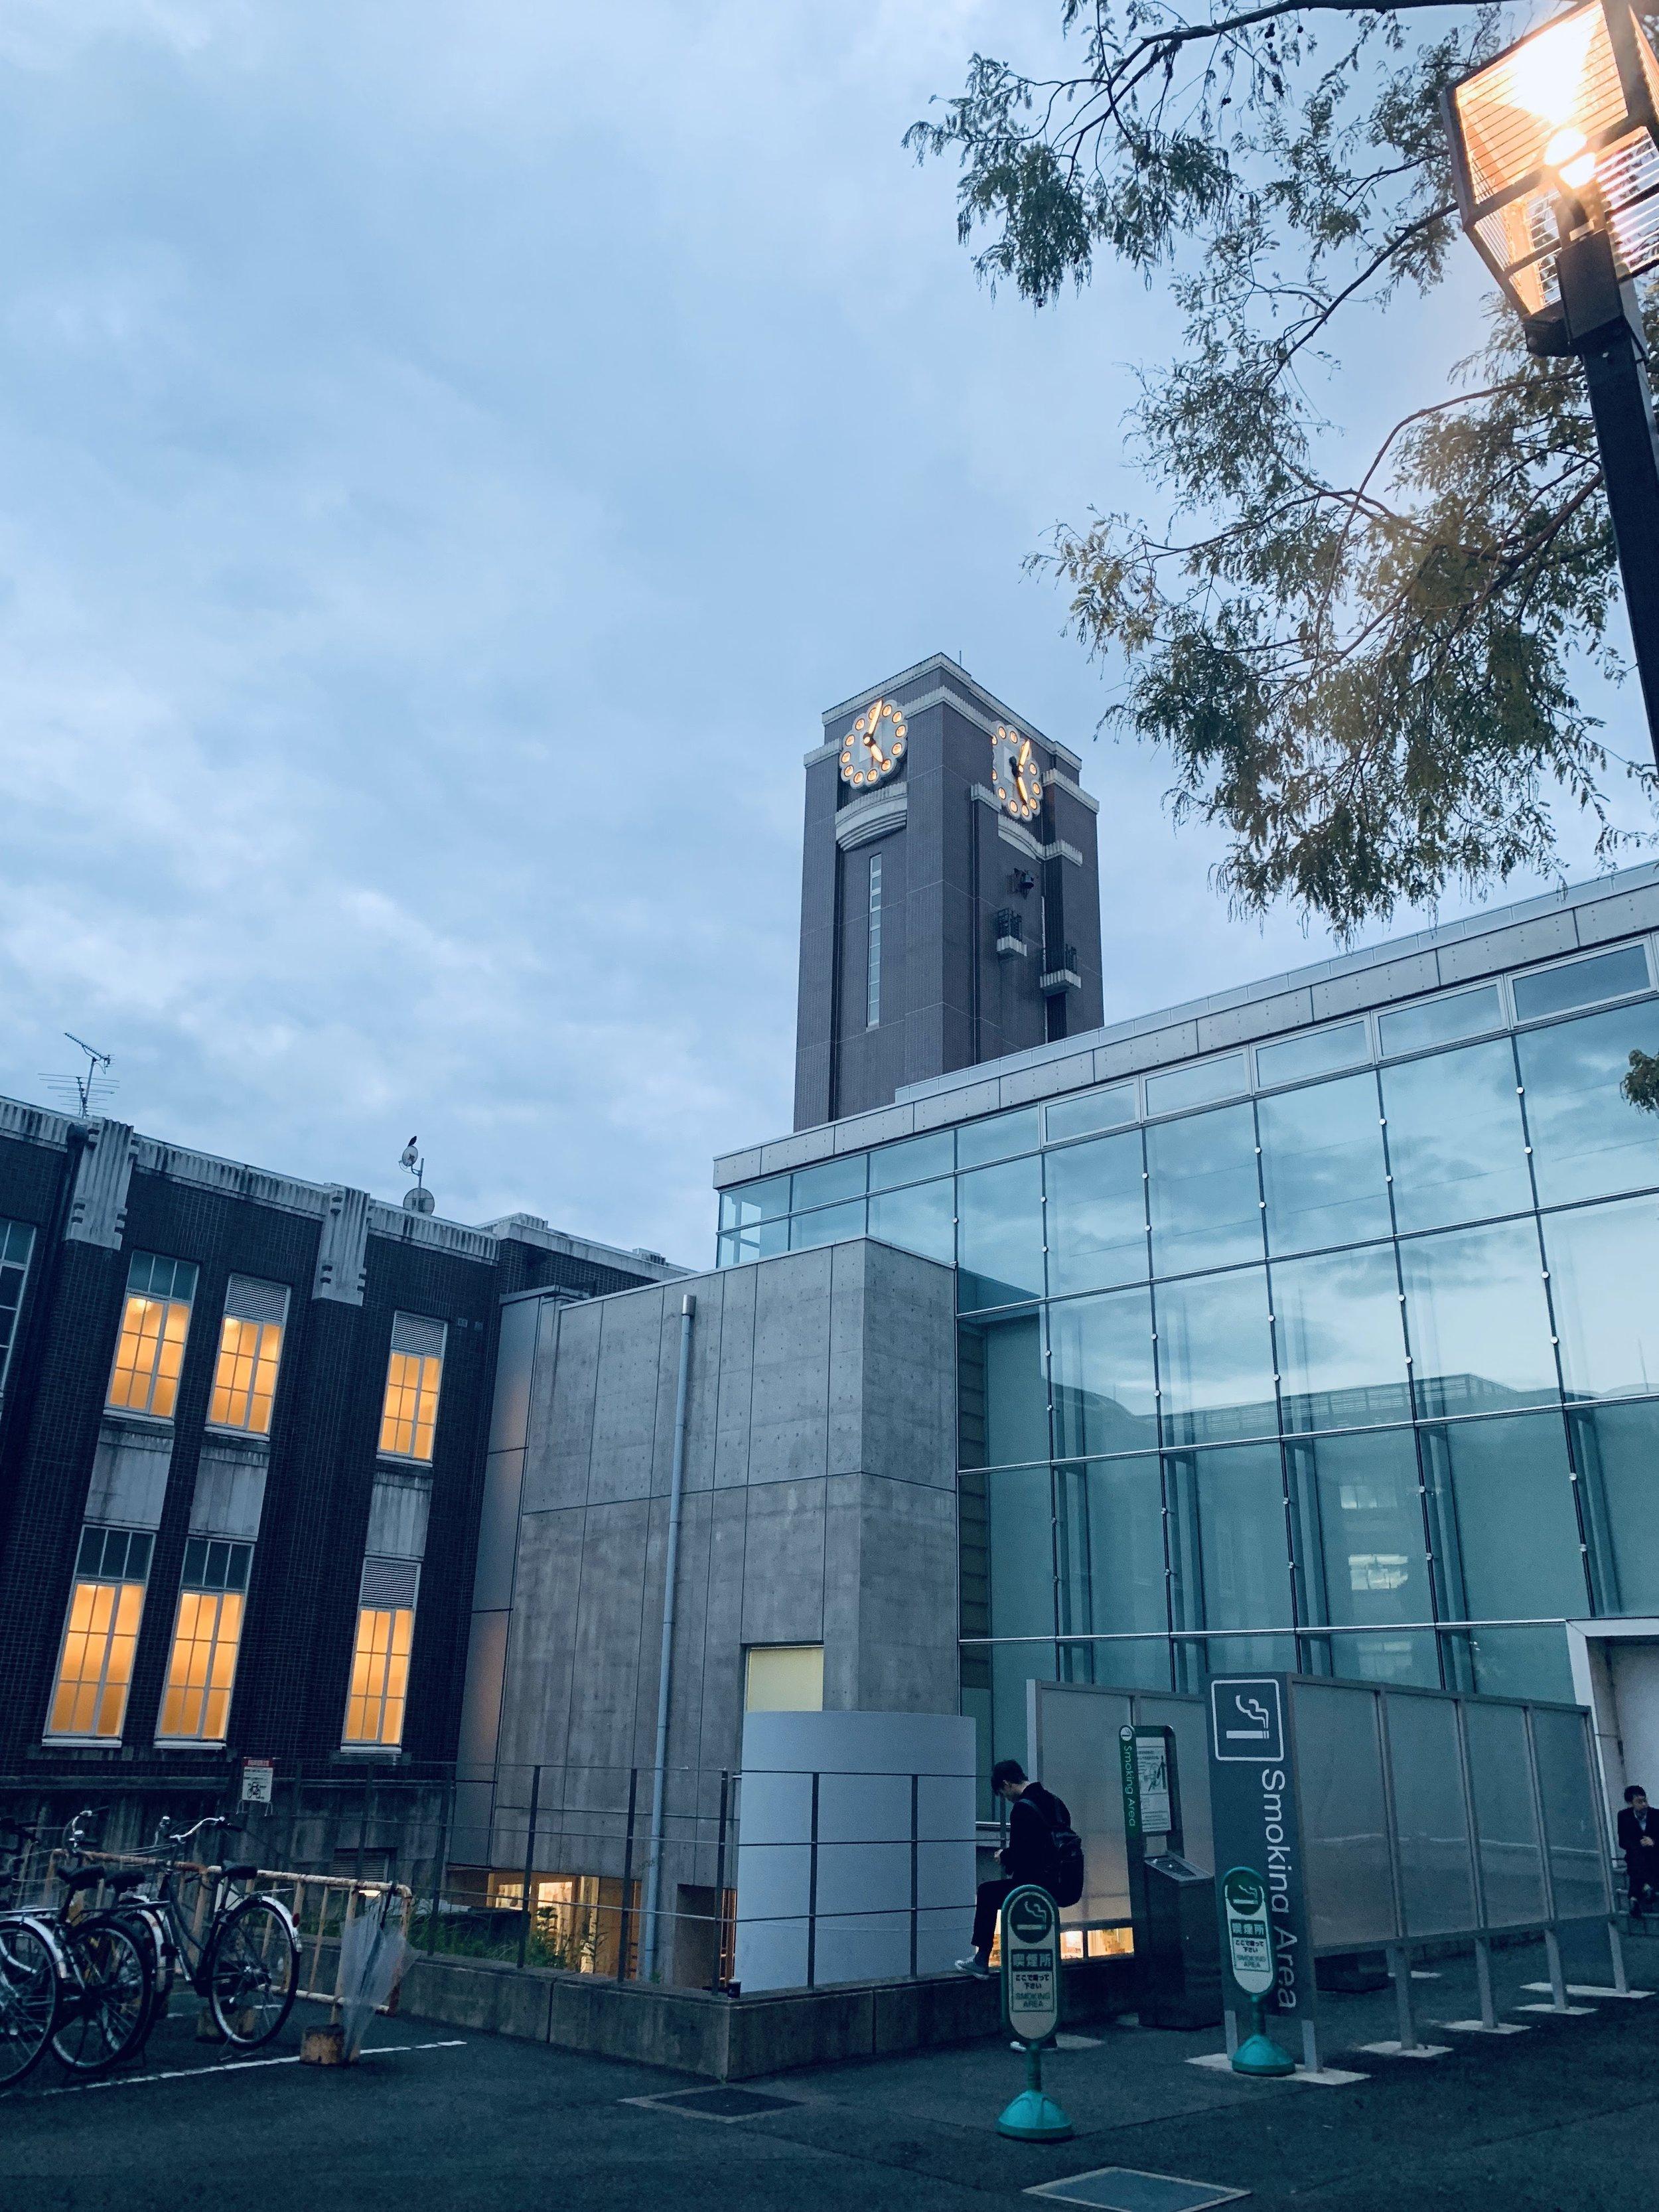 Kyoto University's Main Clock Tower Building